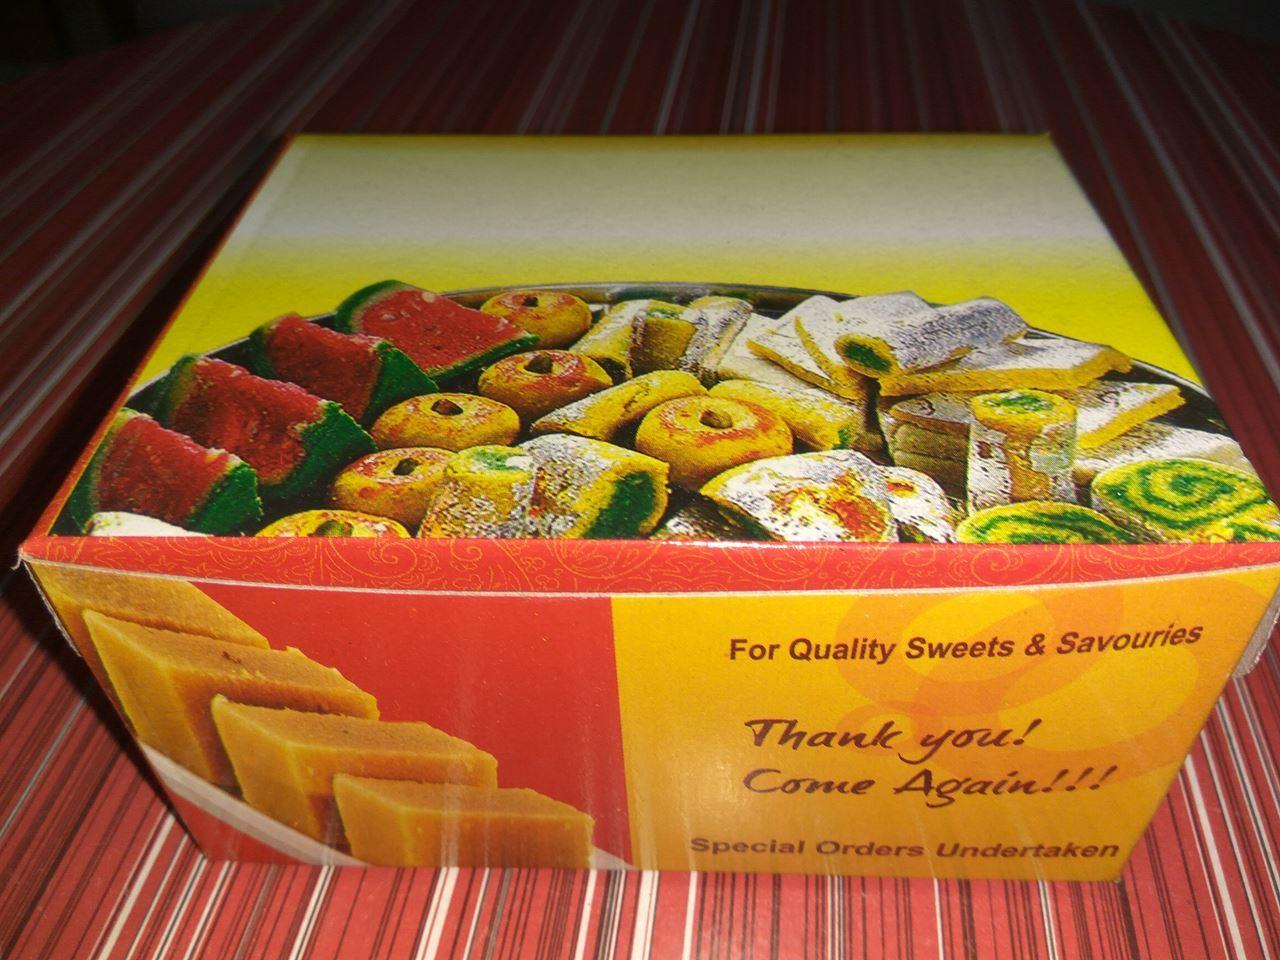 Quarter KG Sweet Box